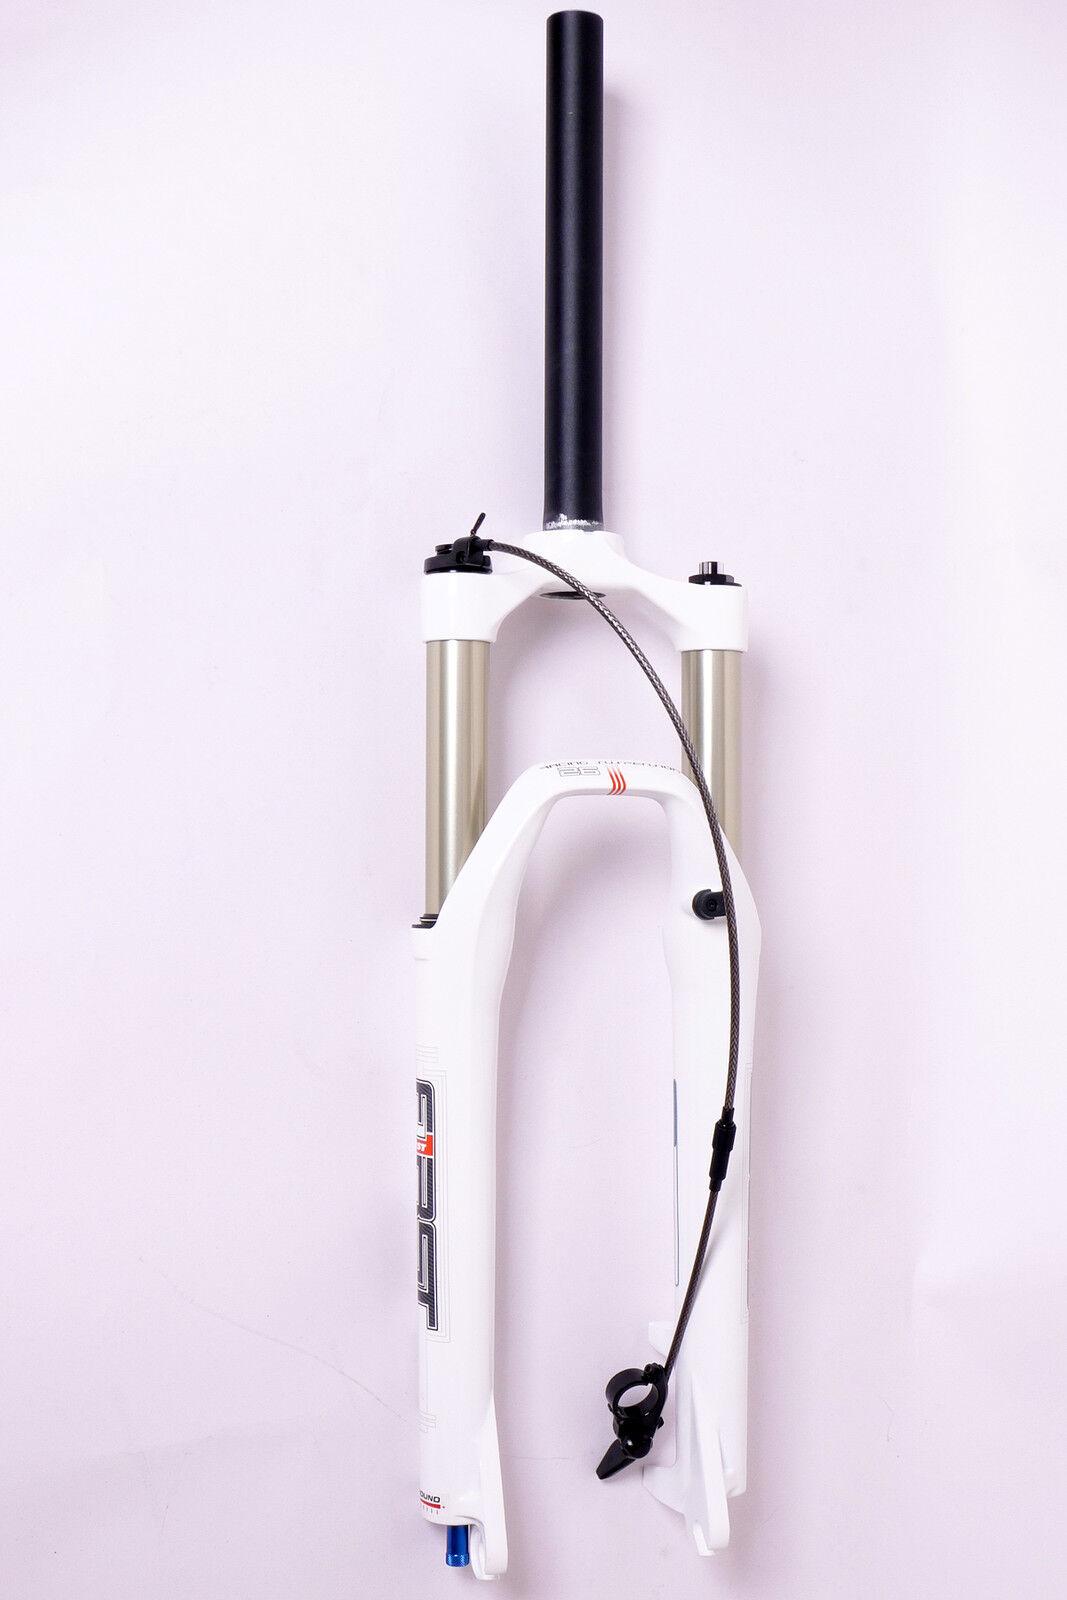 RST First RLC SOSPENSIONE MTB Platinum MOTO FORK 100mm,1 18 26 Disco Bianco